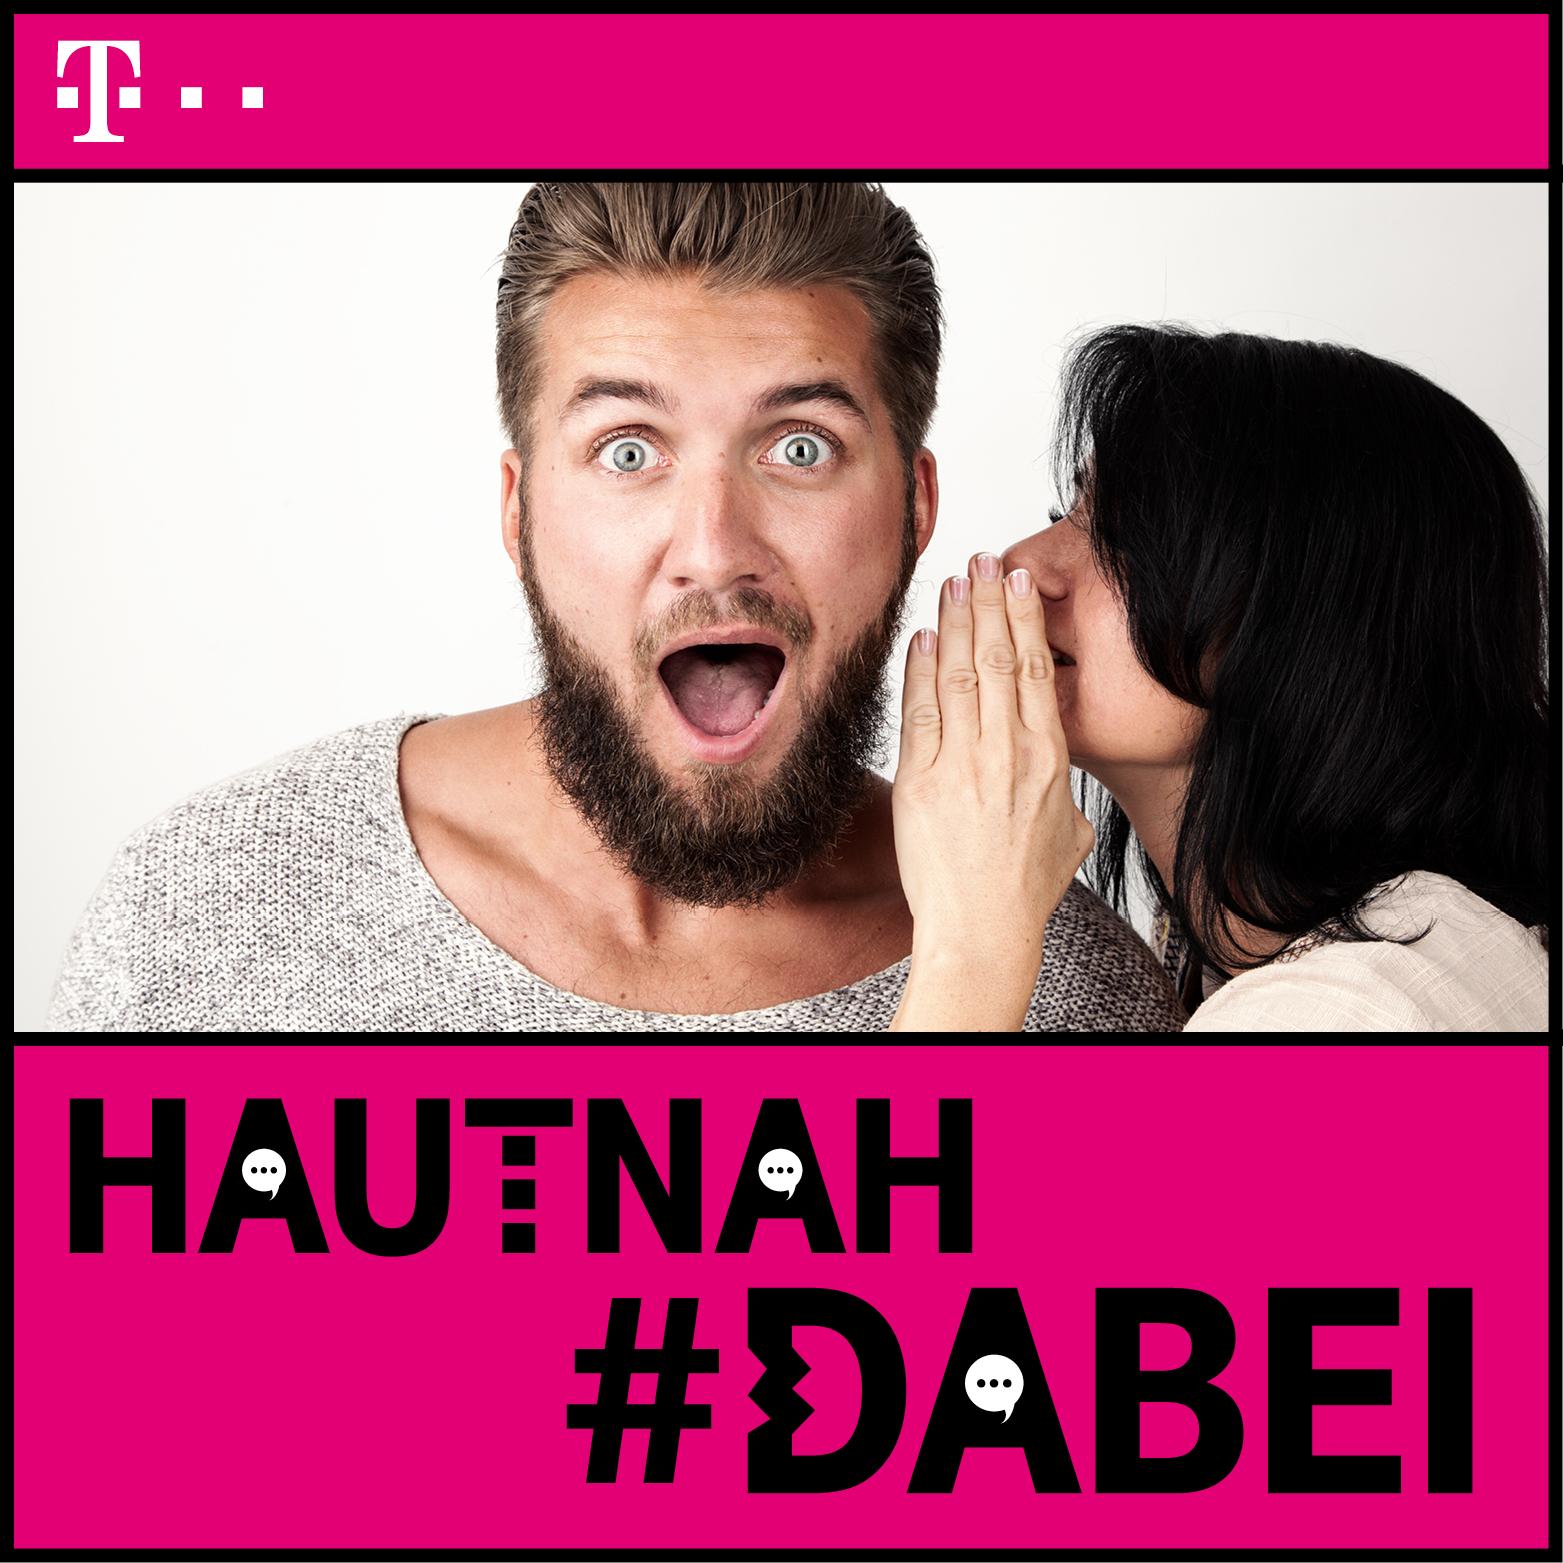 HAUTNAH #DABEI PODCAST - Trailer